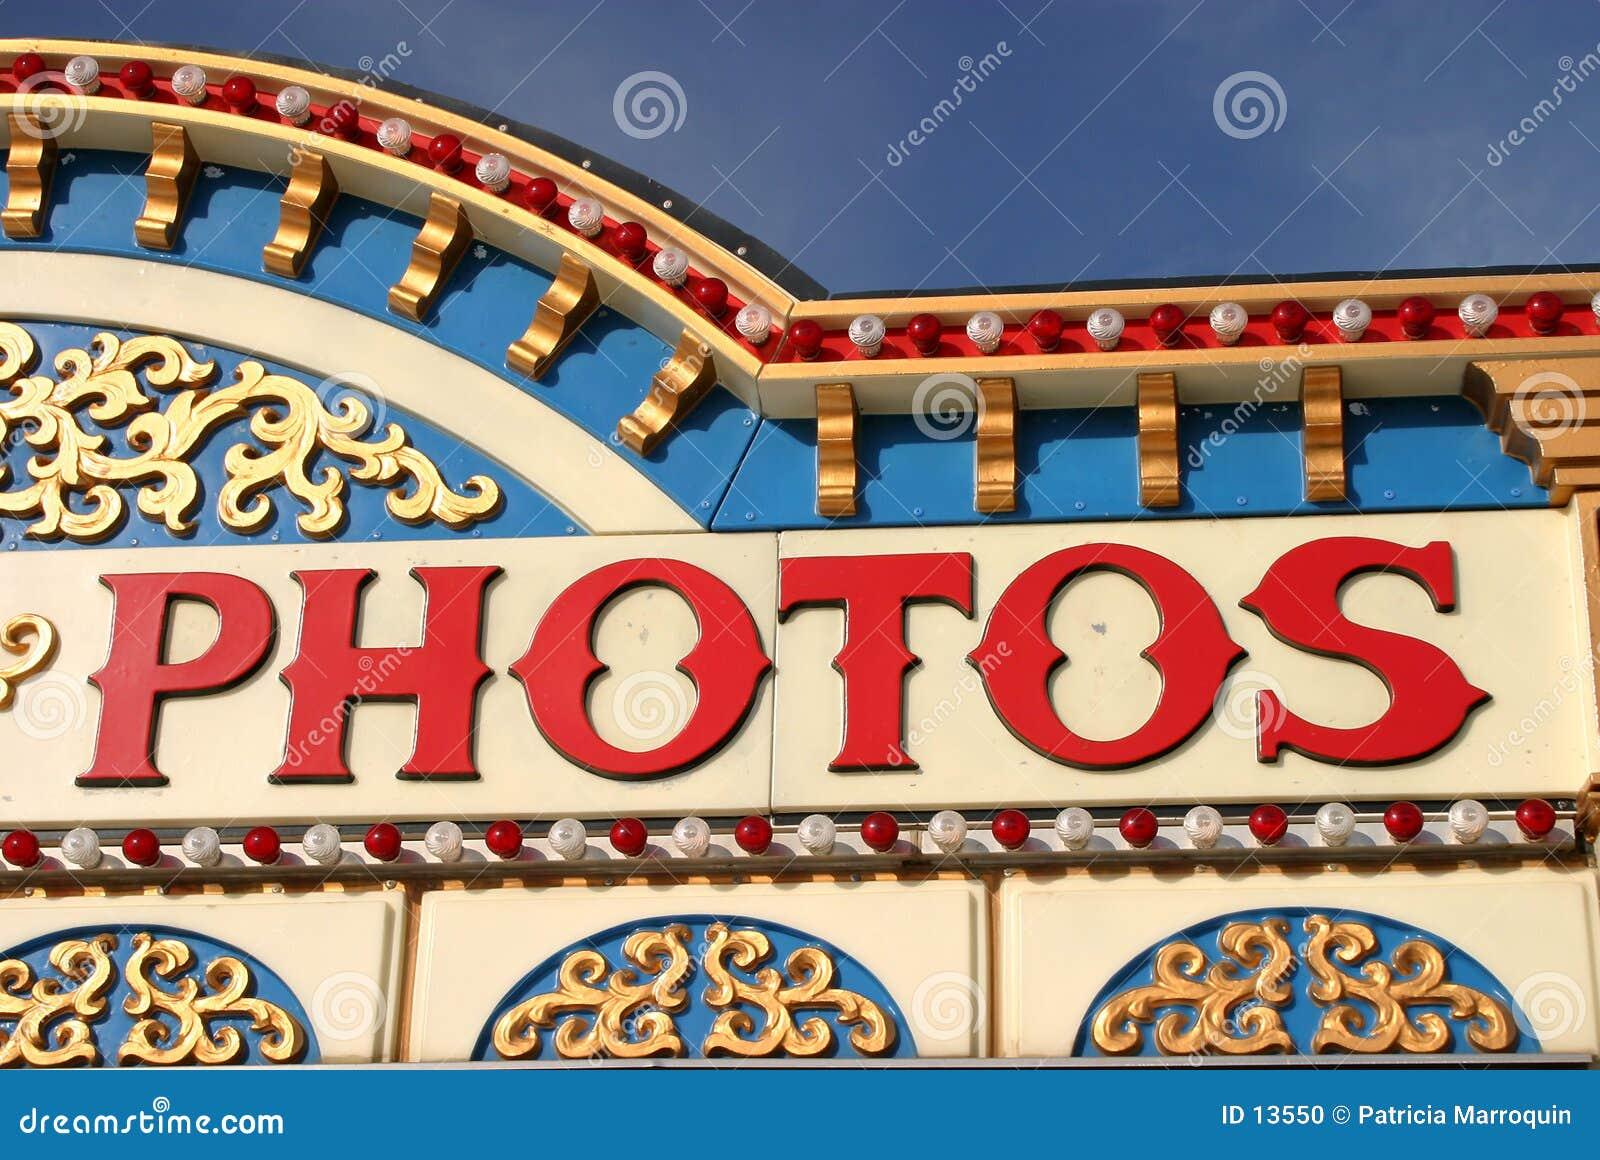 Fabulous Fotos